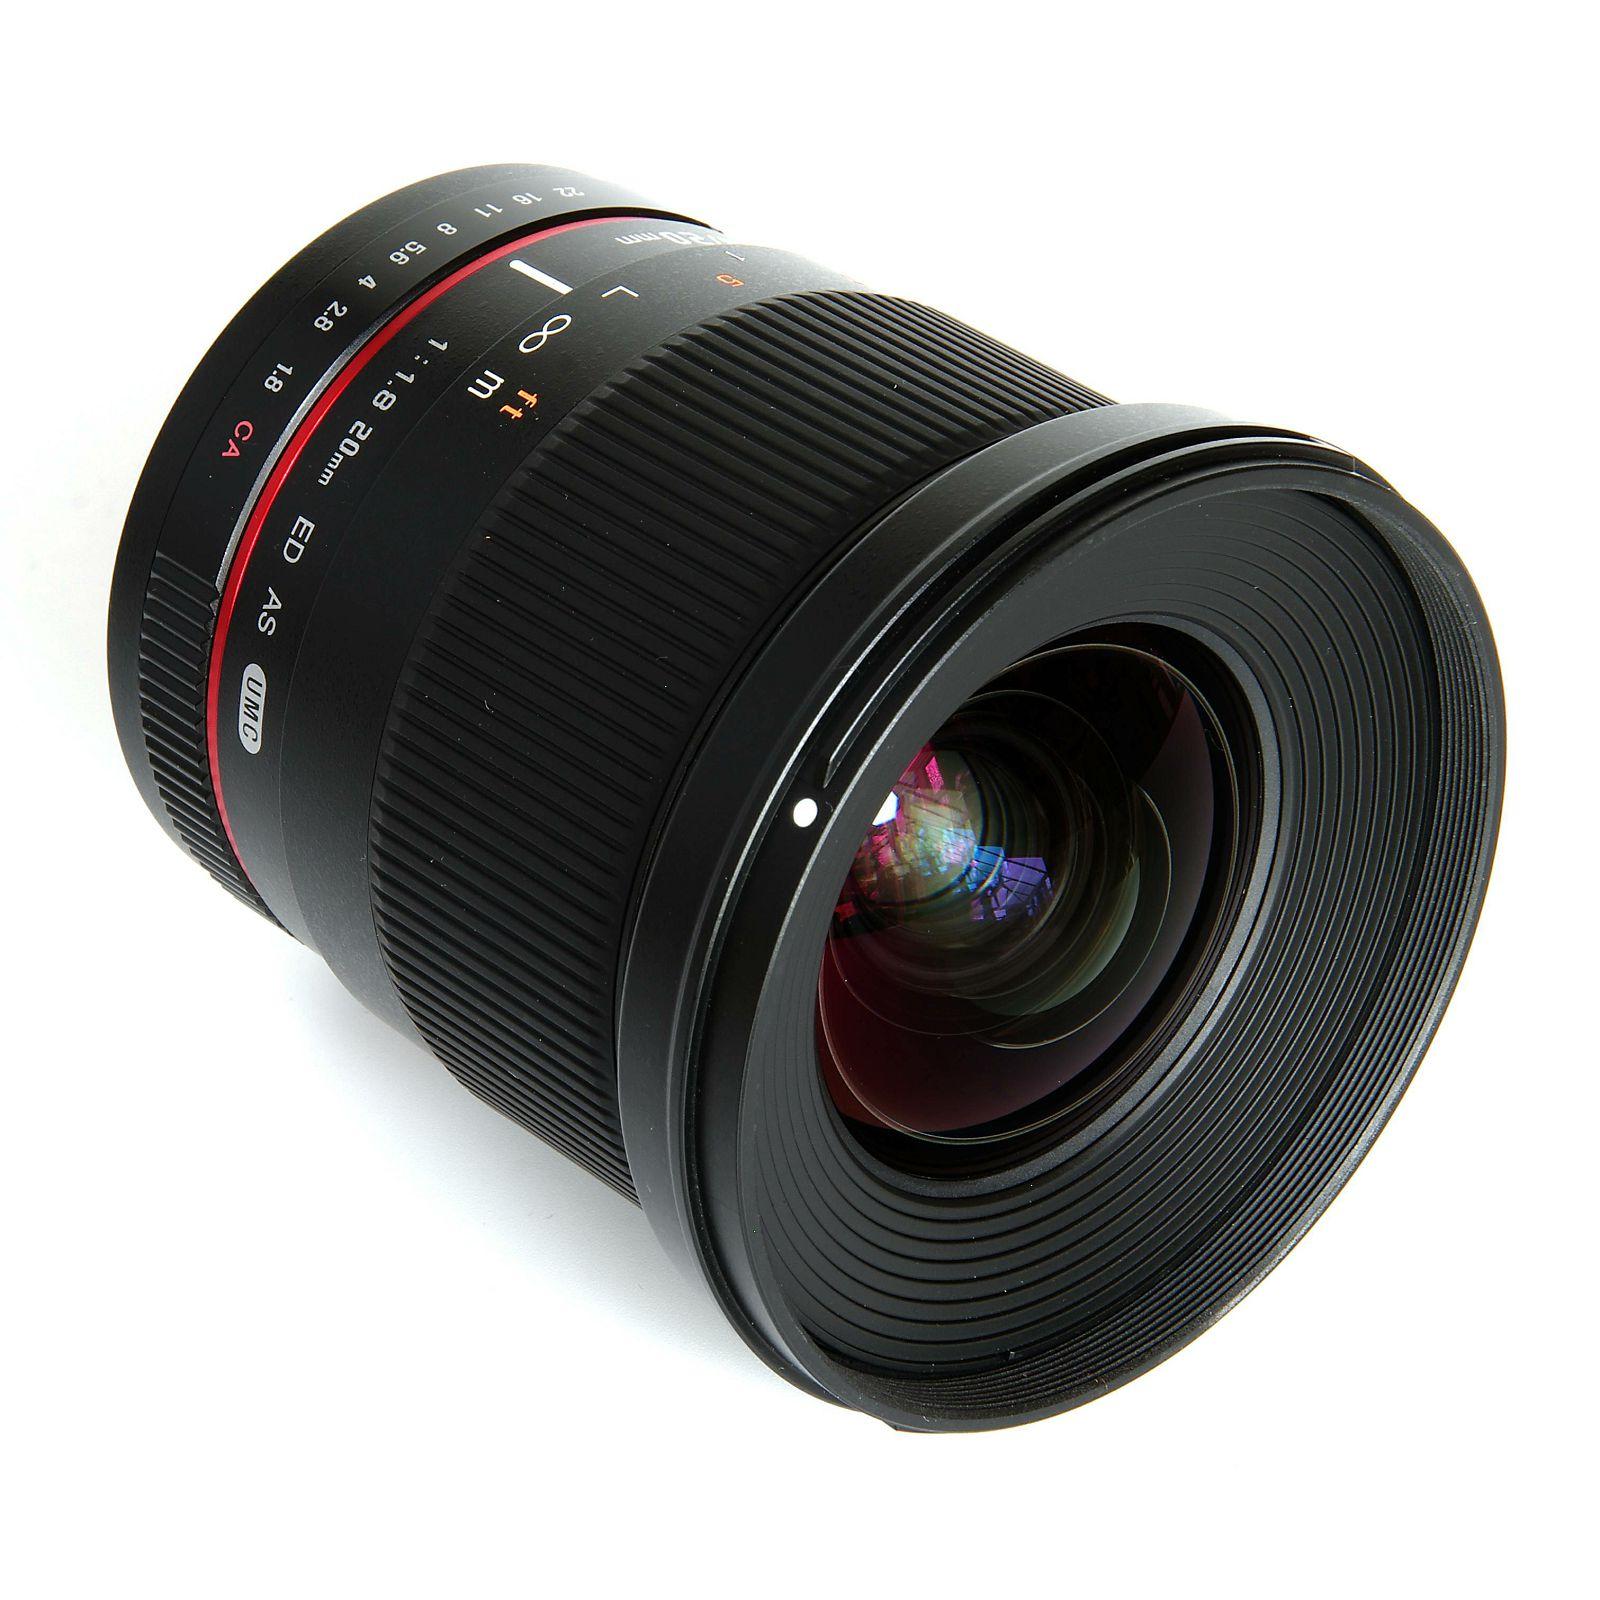 Samyang 20mm f/1.8 ED AS UMC širokokutni objektiv za Samsung NX